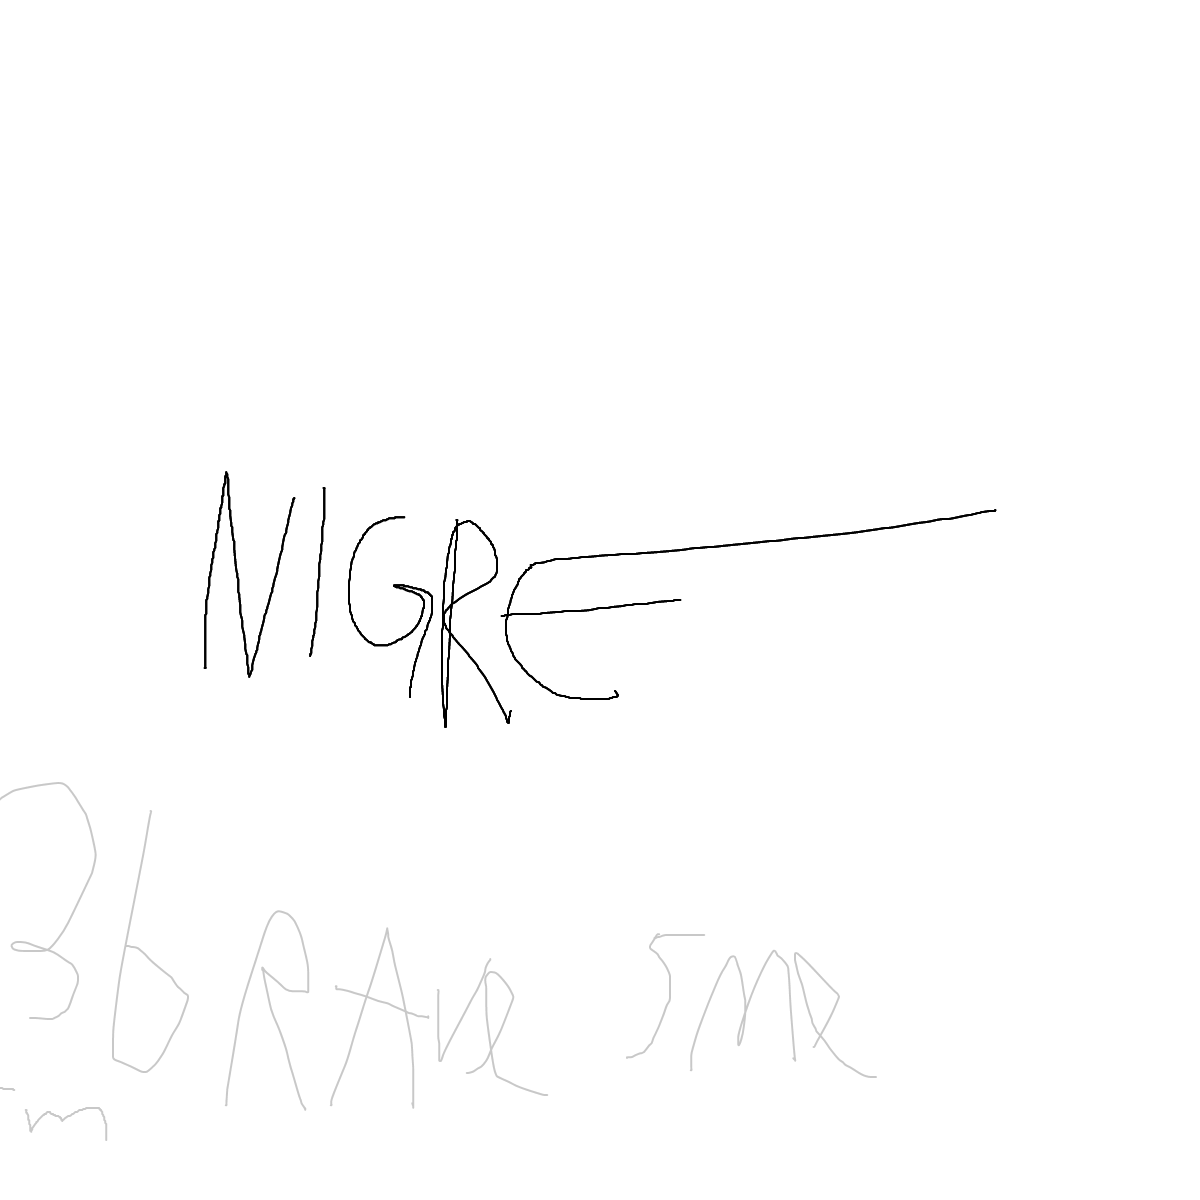 BAAAM drawing#6886 lat:-12.0500154495239260lng: -51.5038337707519500